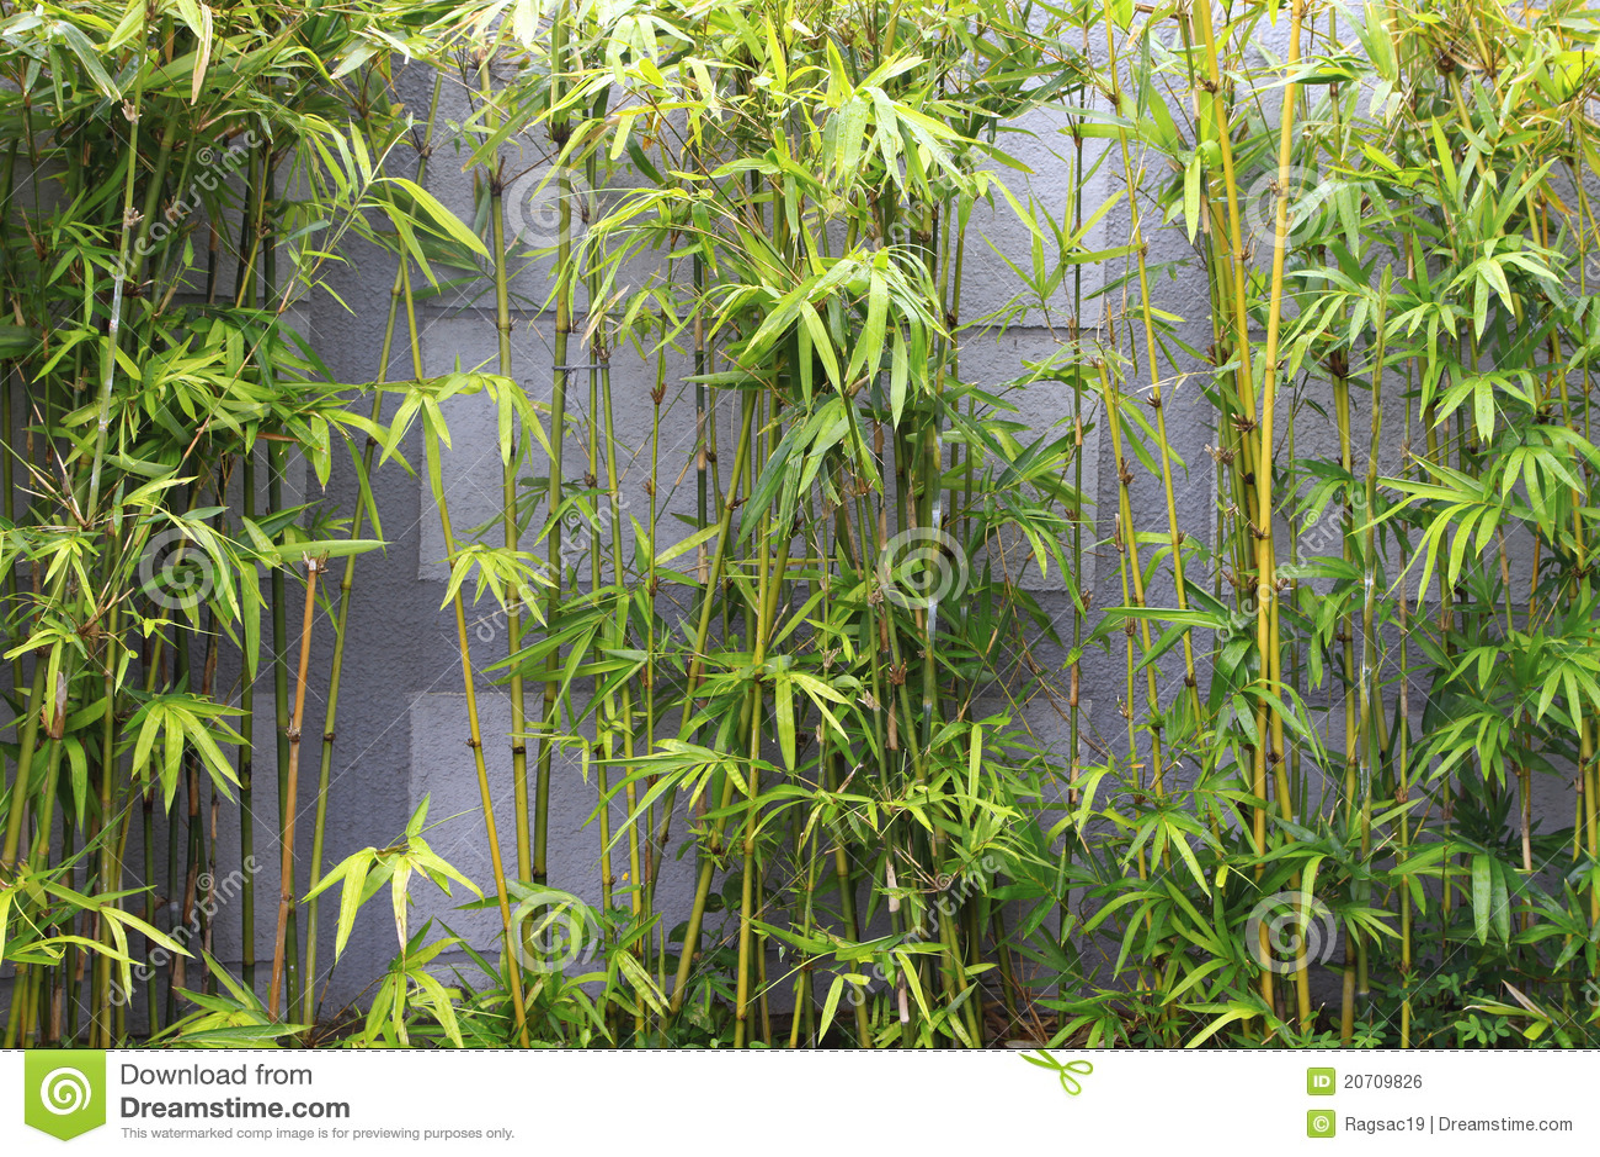 Jard n de bamb imagen de archivo libre de regal as - Jardin de bambu talavera ...